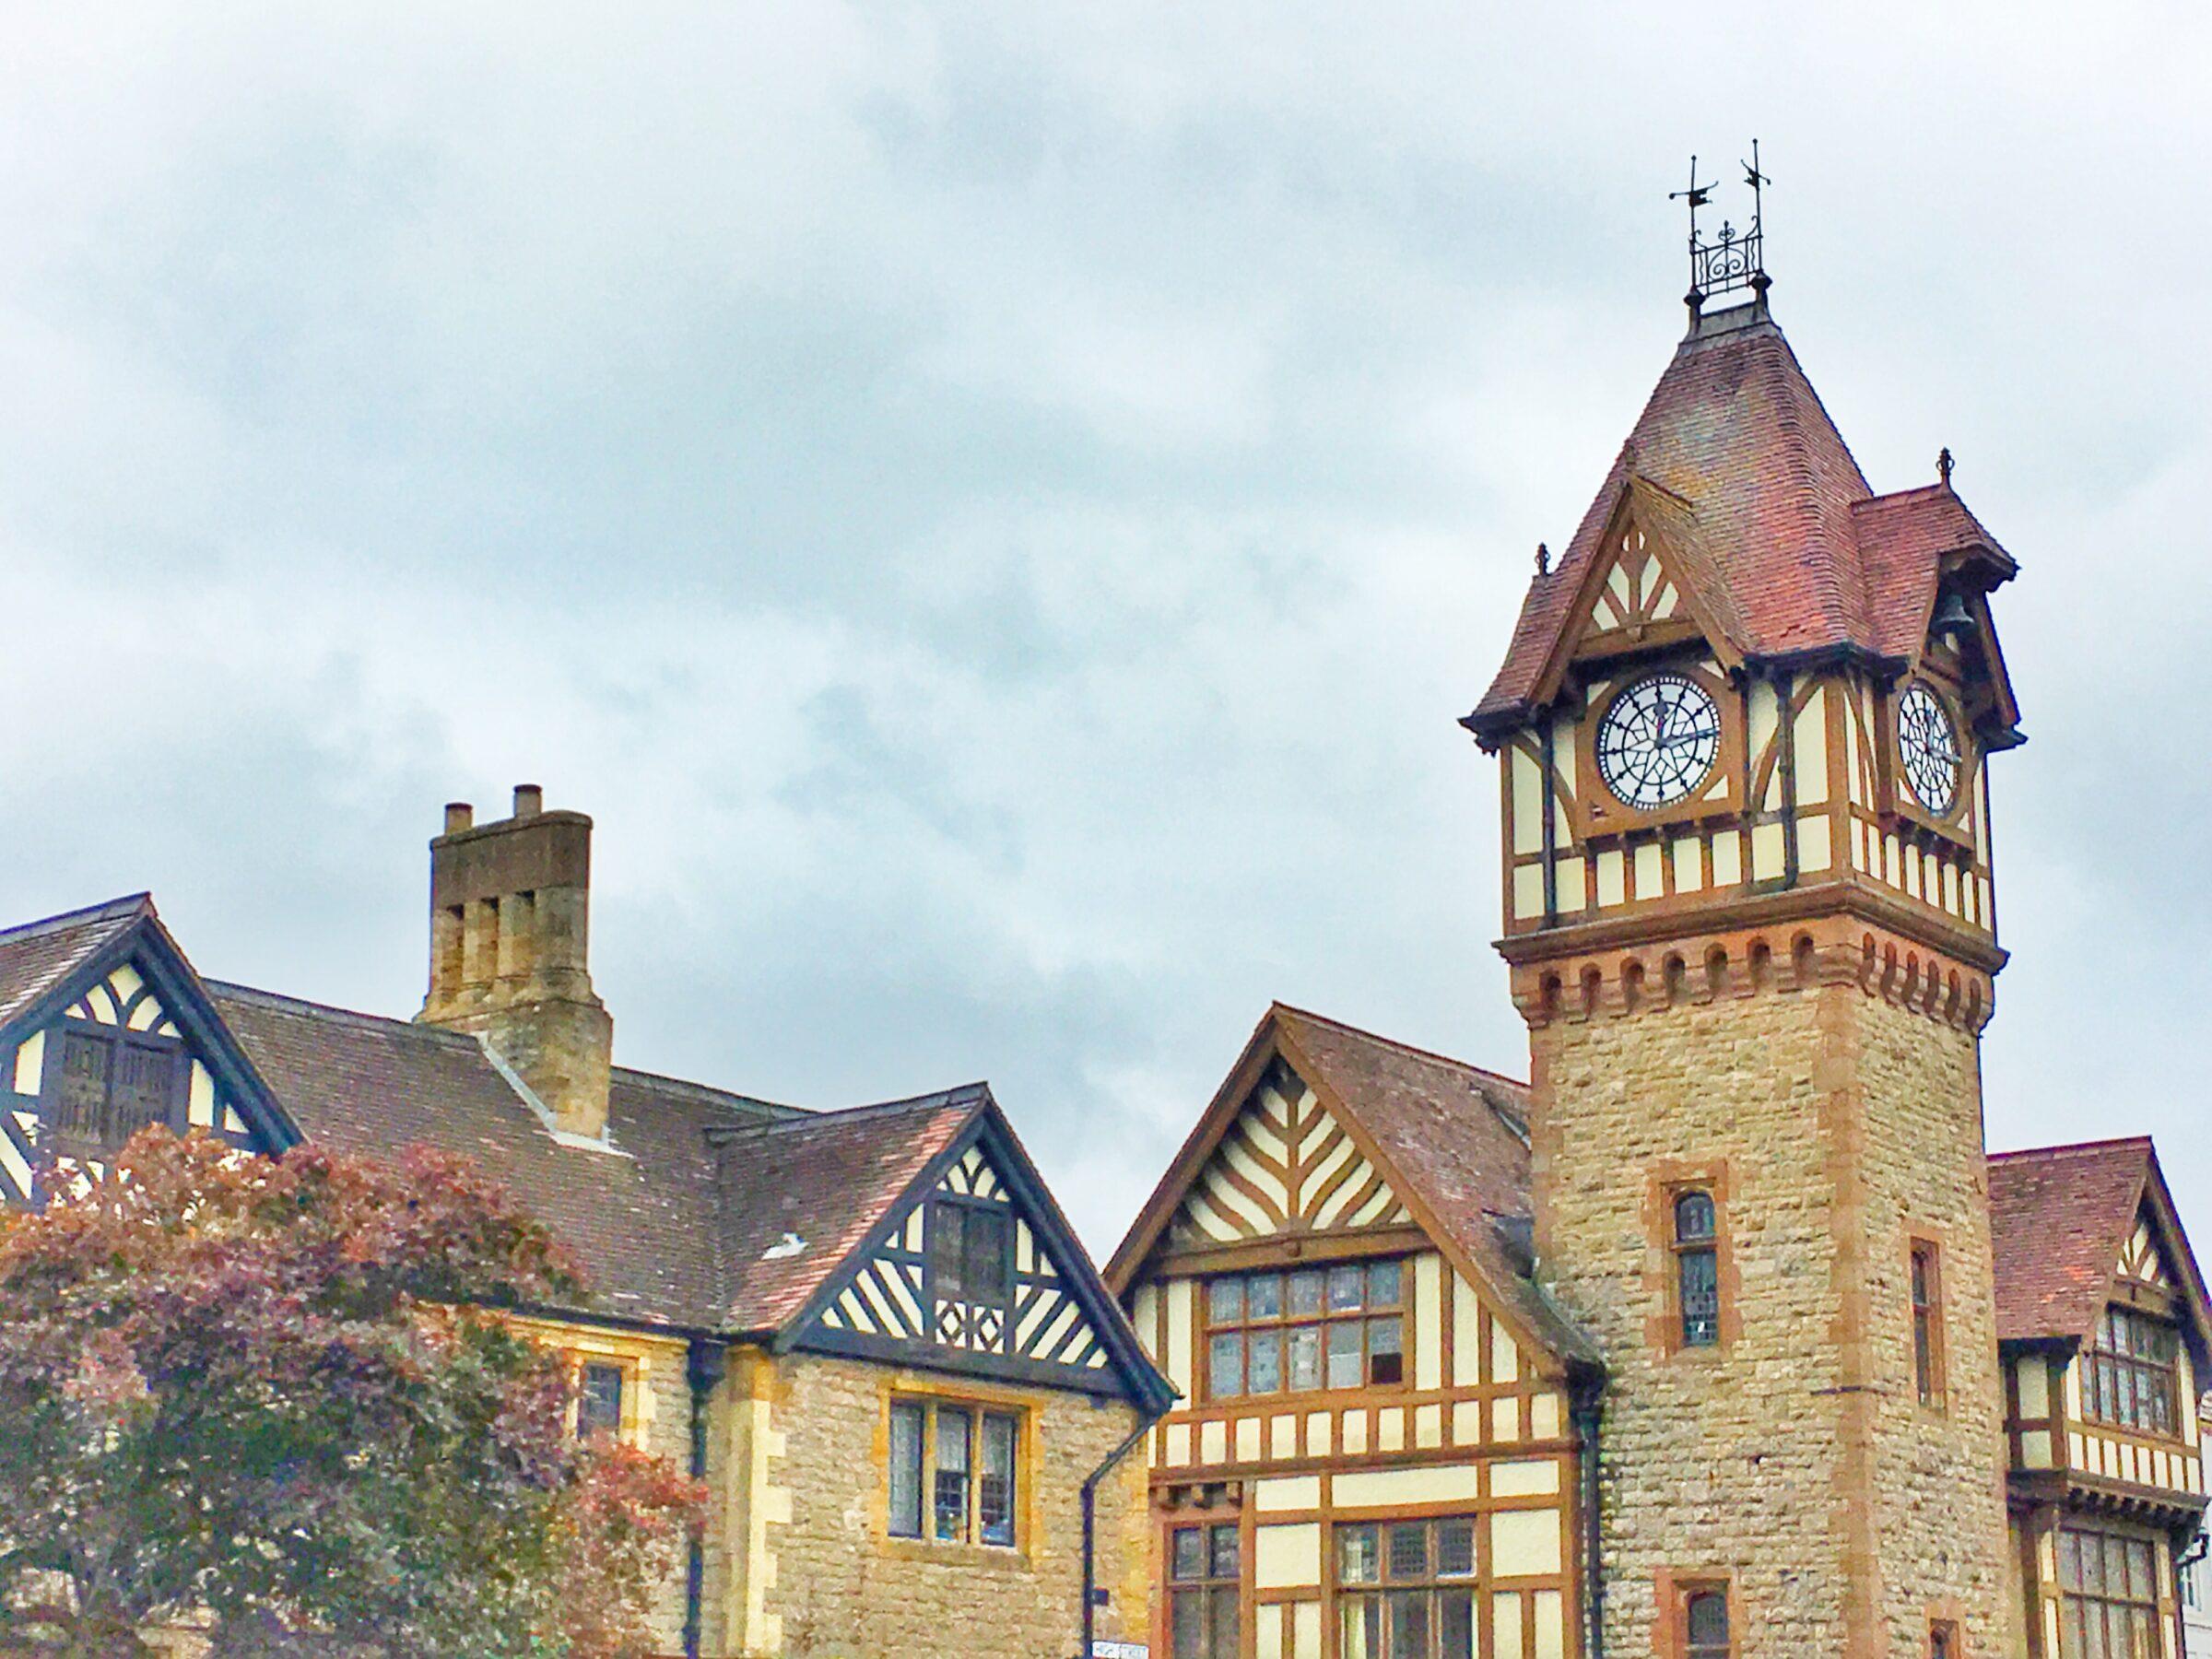 Ledbury clock tower